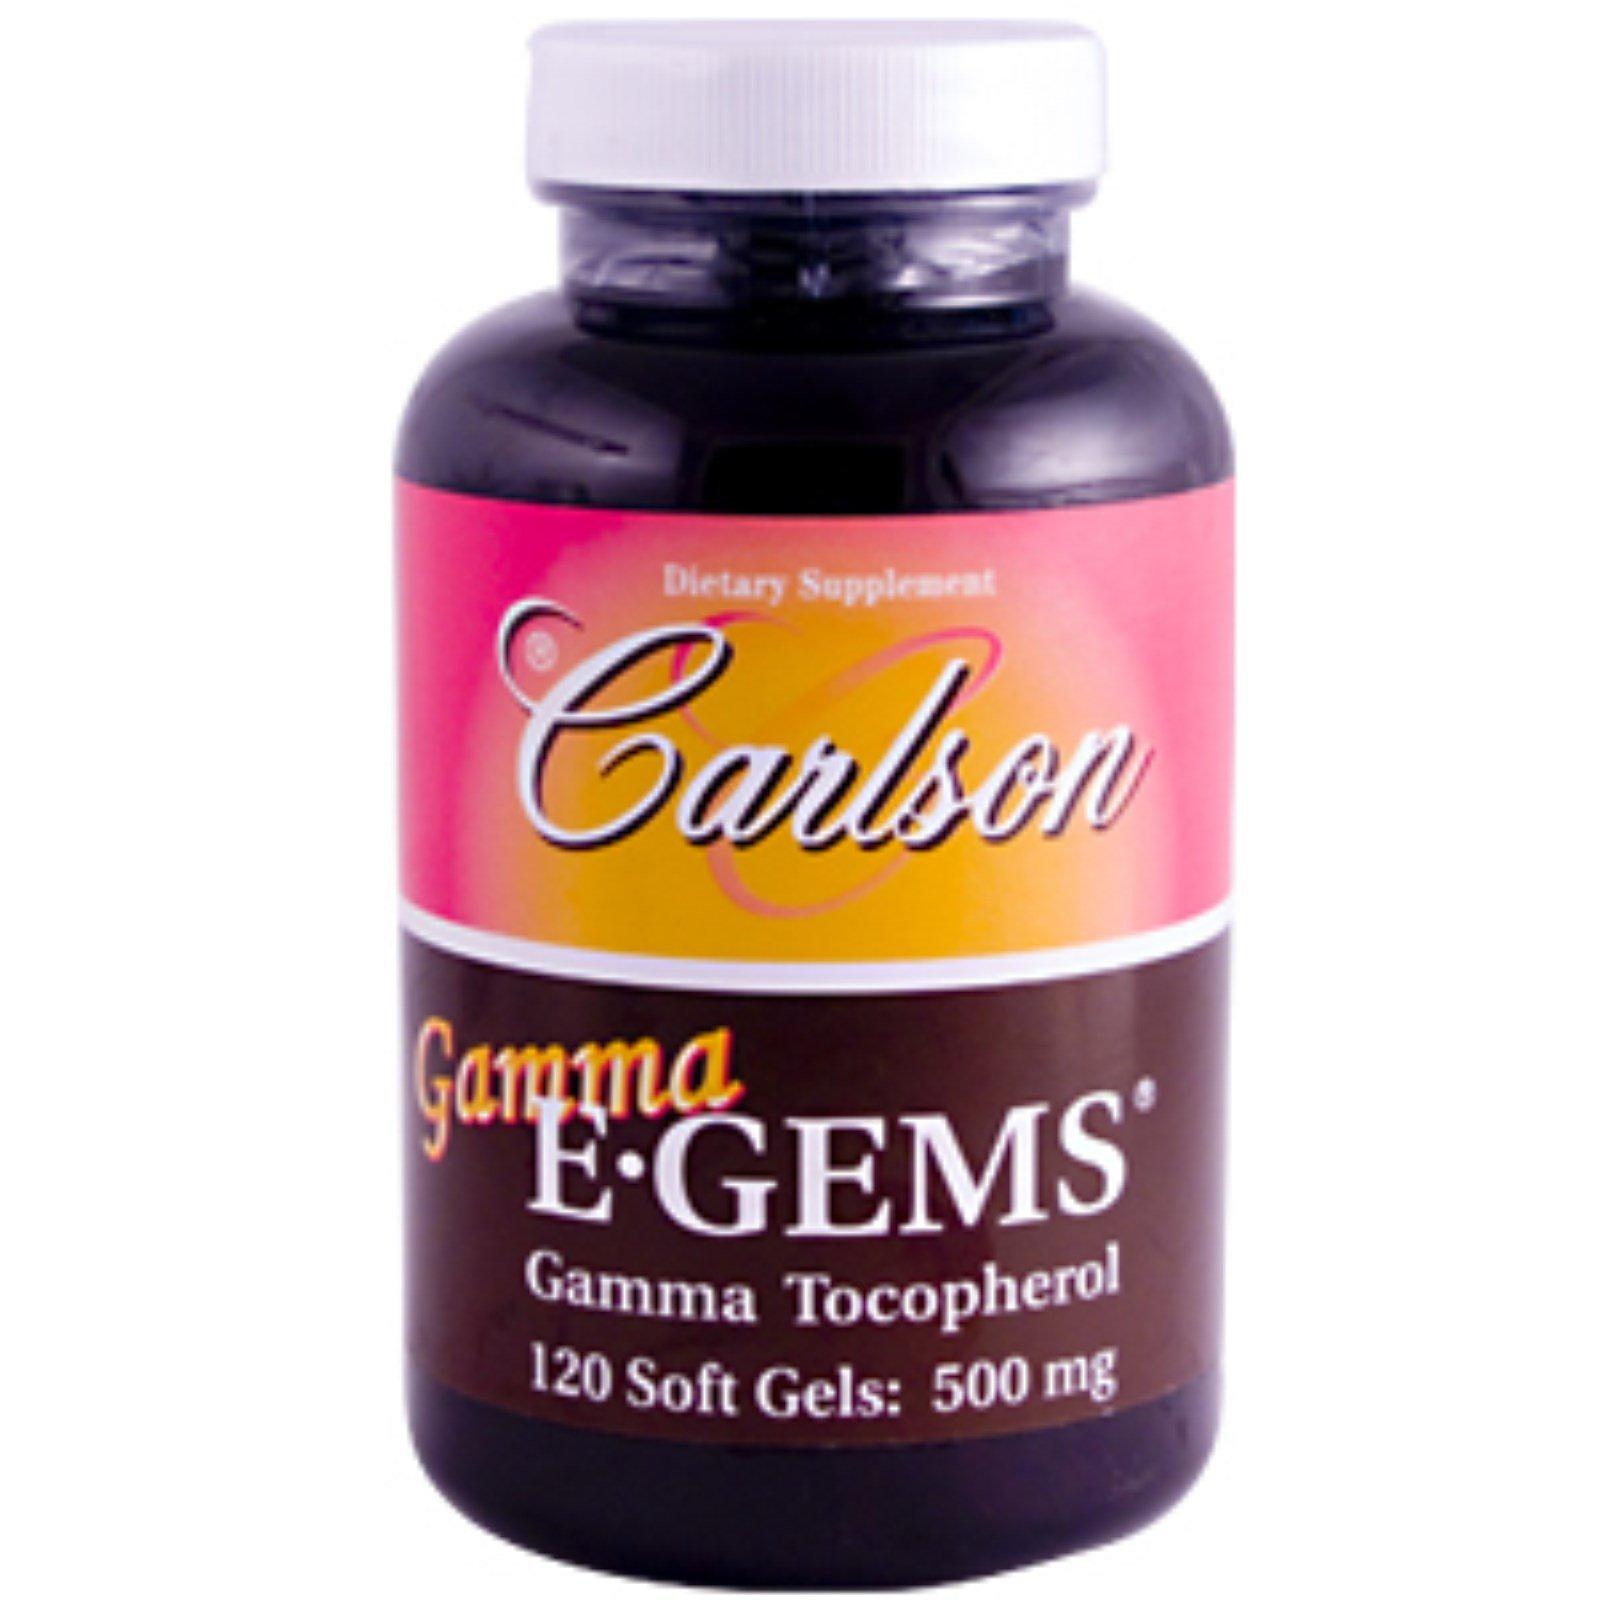 Carlson Labs Gamma E-Gems, Gamma Tocopherol, 465mg, 120 softgels